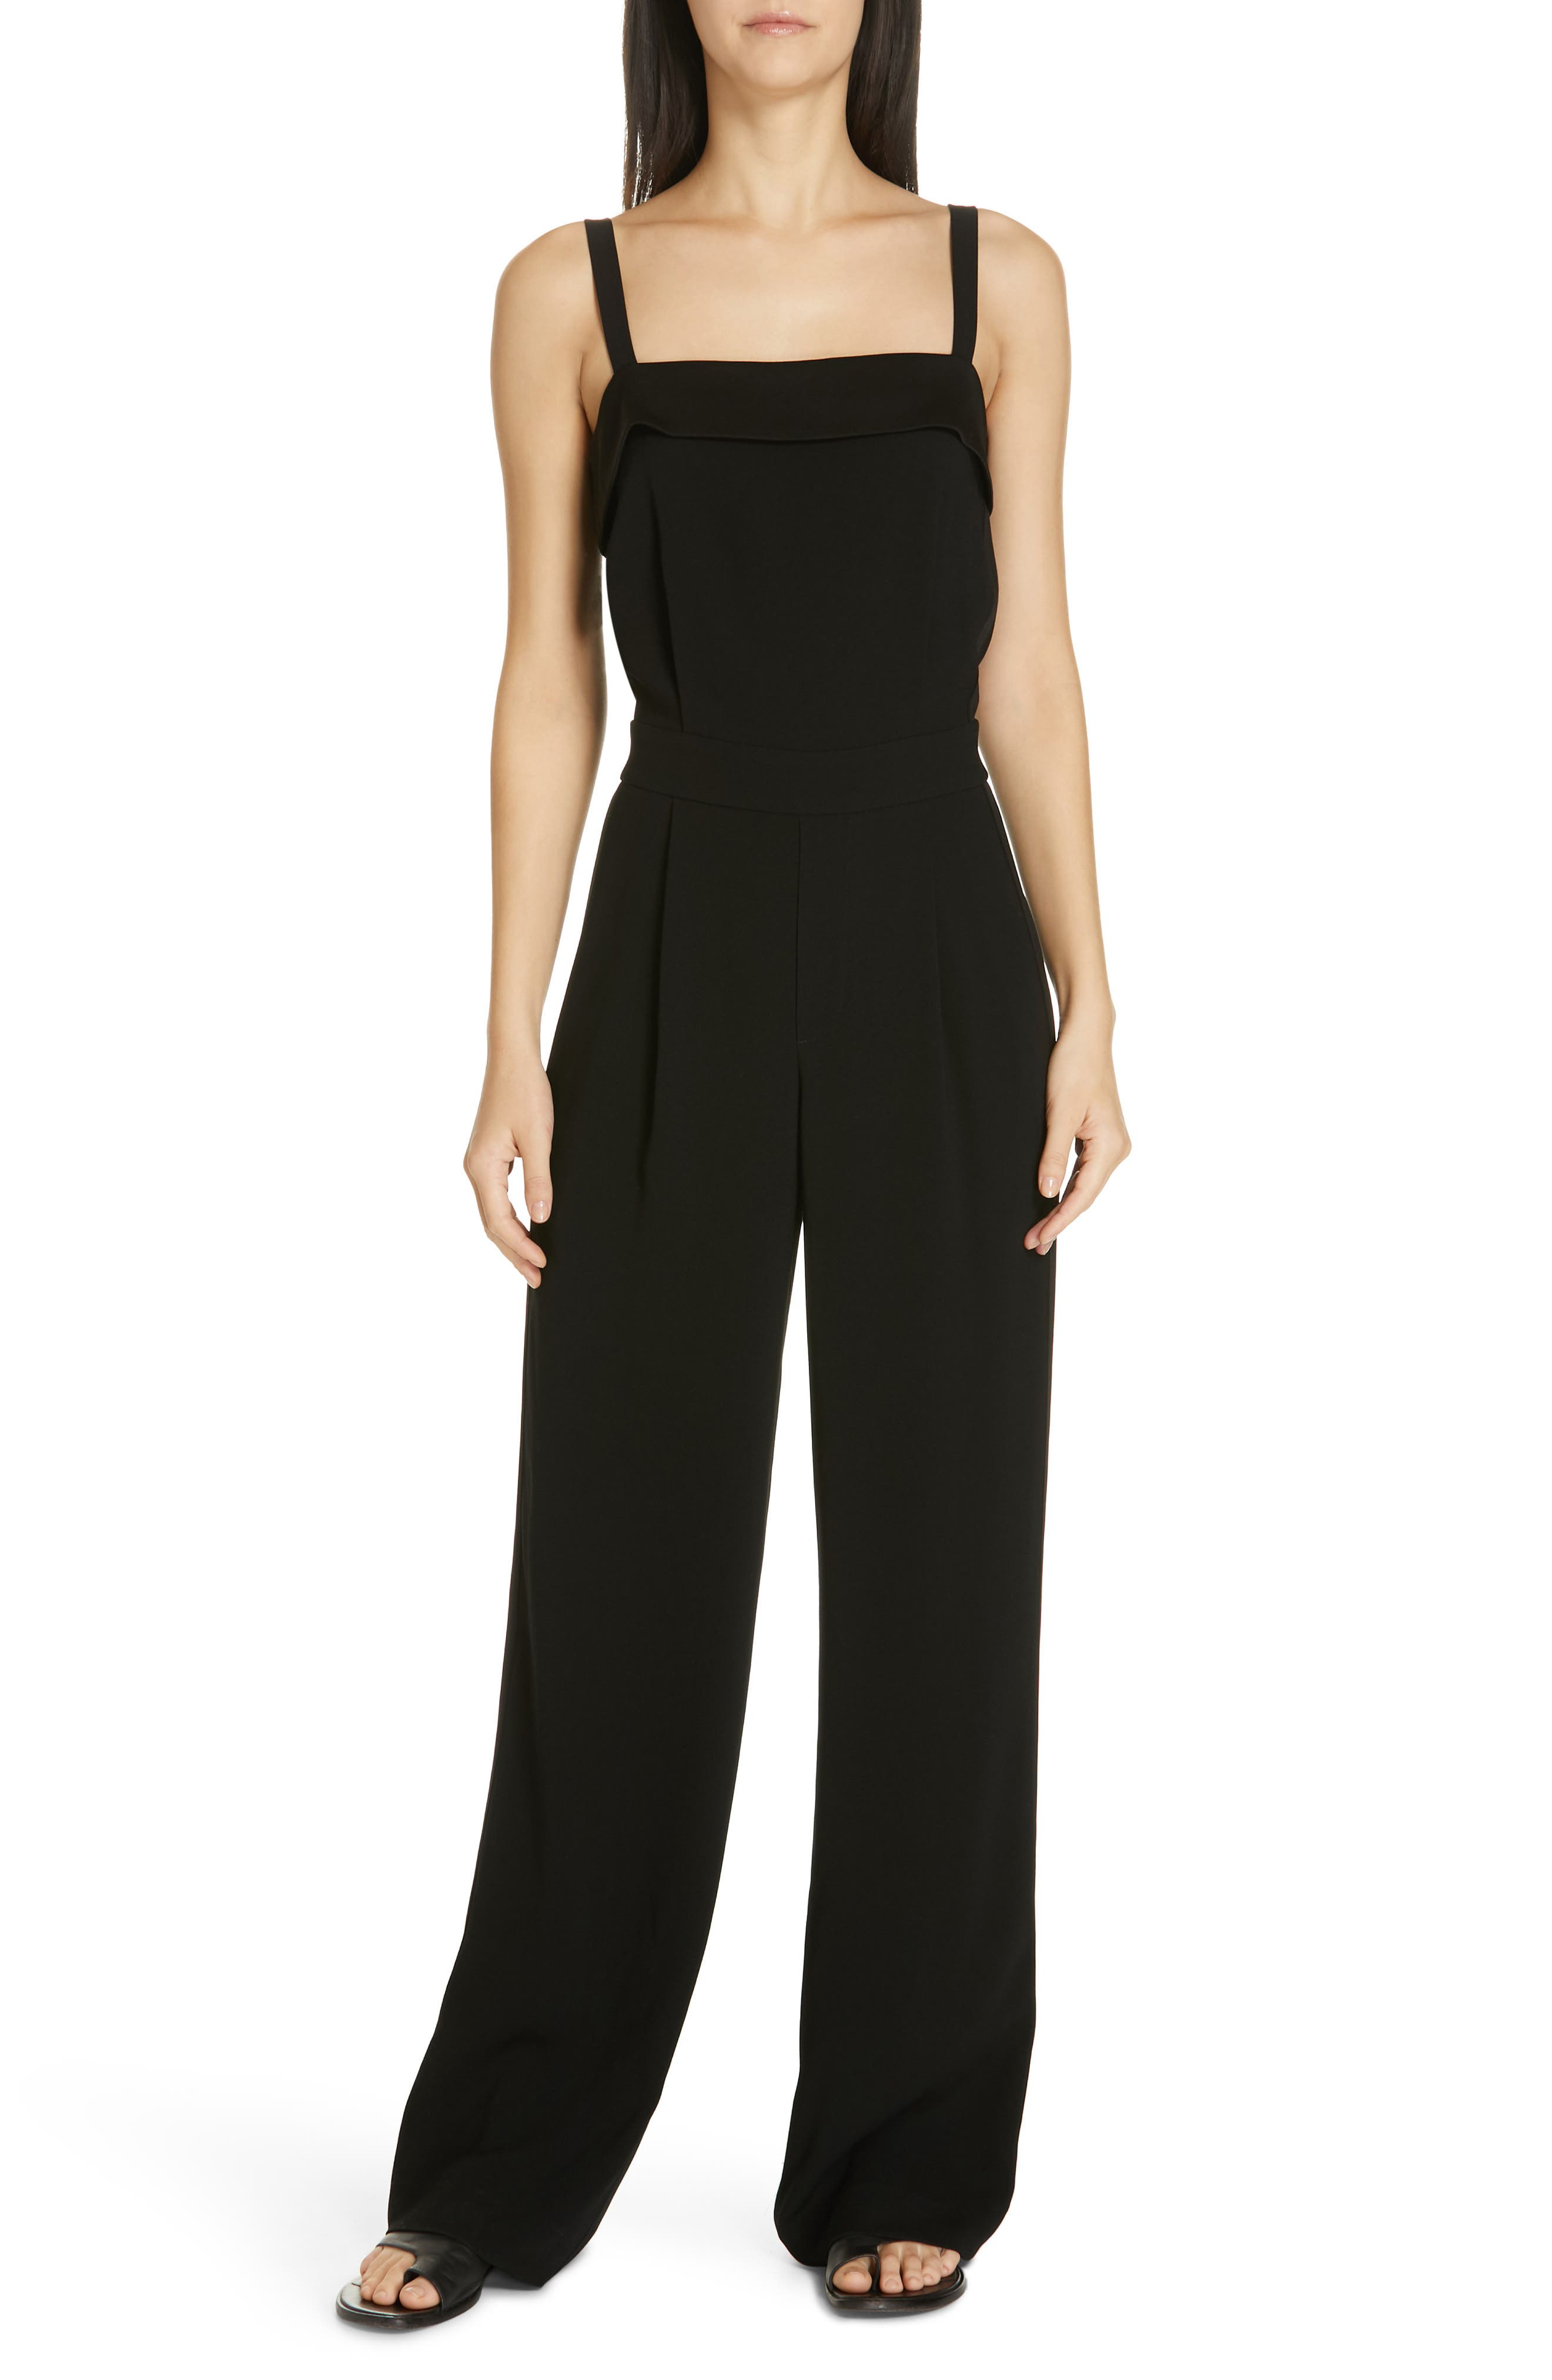 VINCE Sleeveless Tuxedo Jumpsuit, Main, color, BLACK